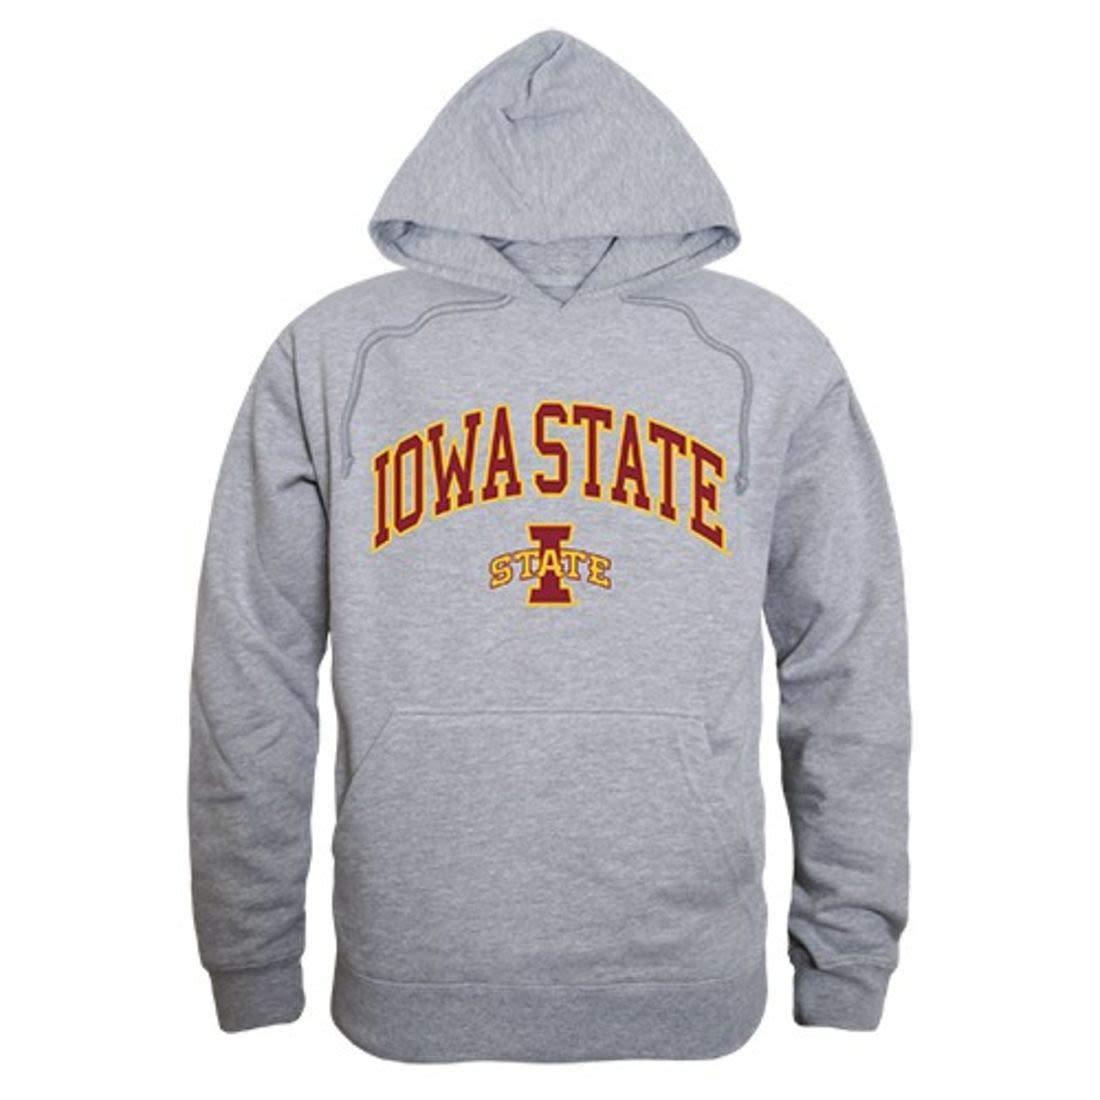 best website 12e45 19fd3 W Republic Apparel Iowa State University University University Cyclones  Campus Hoodie Sweatshirt Heather Grey b9b435